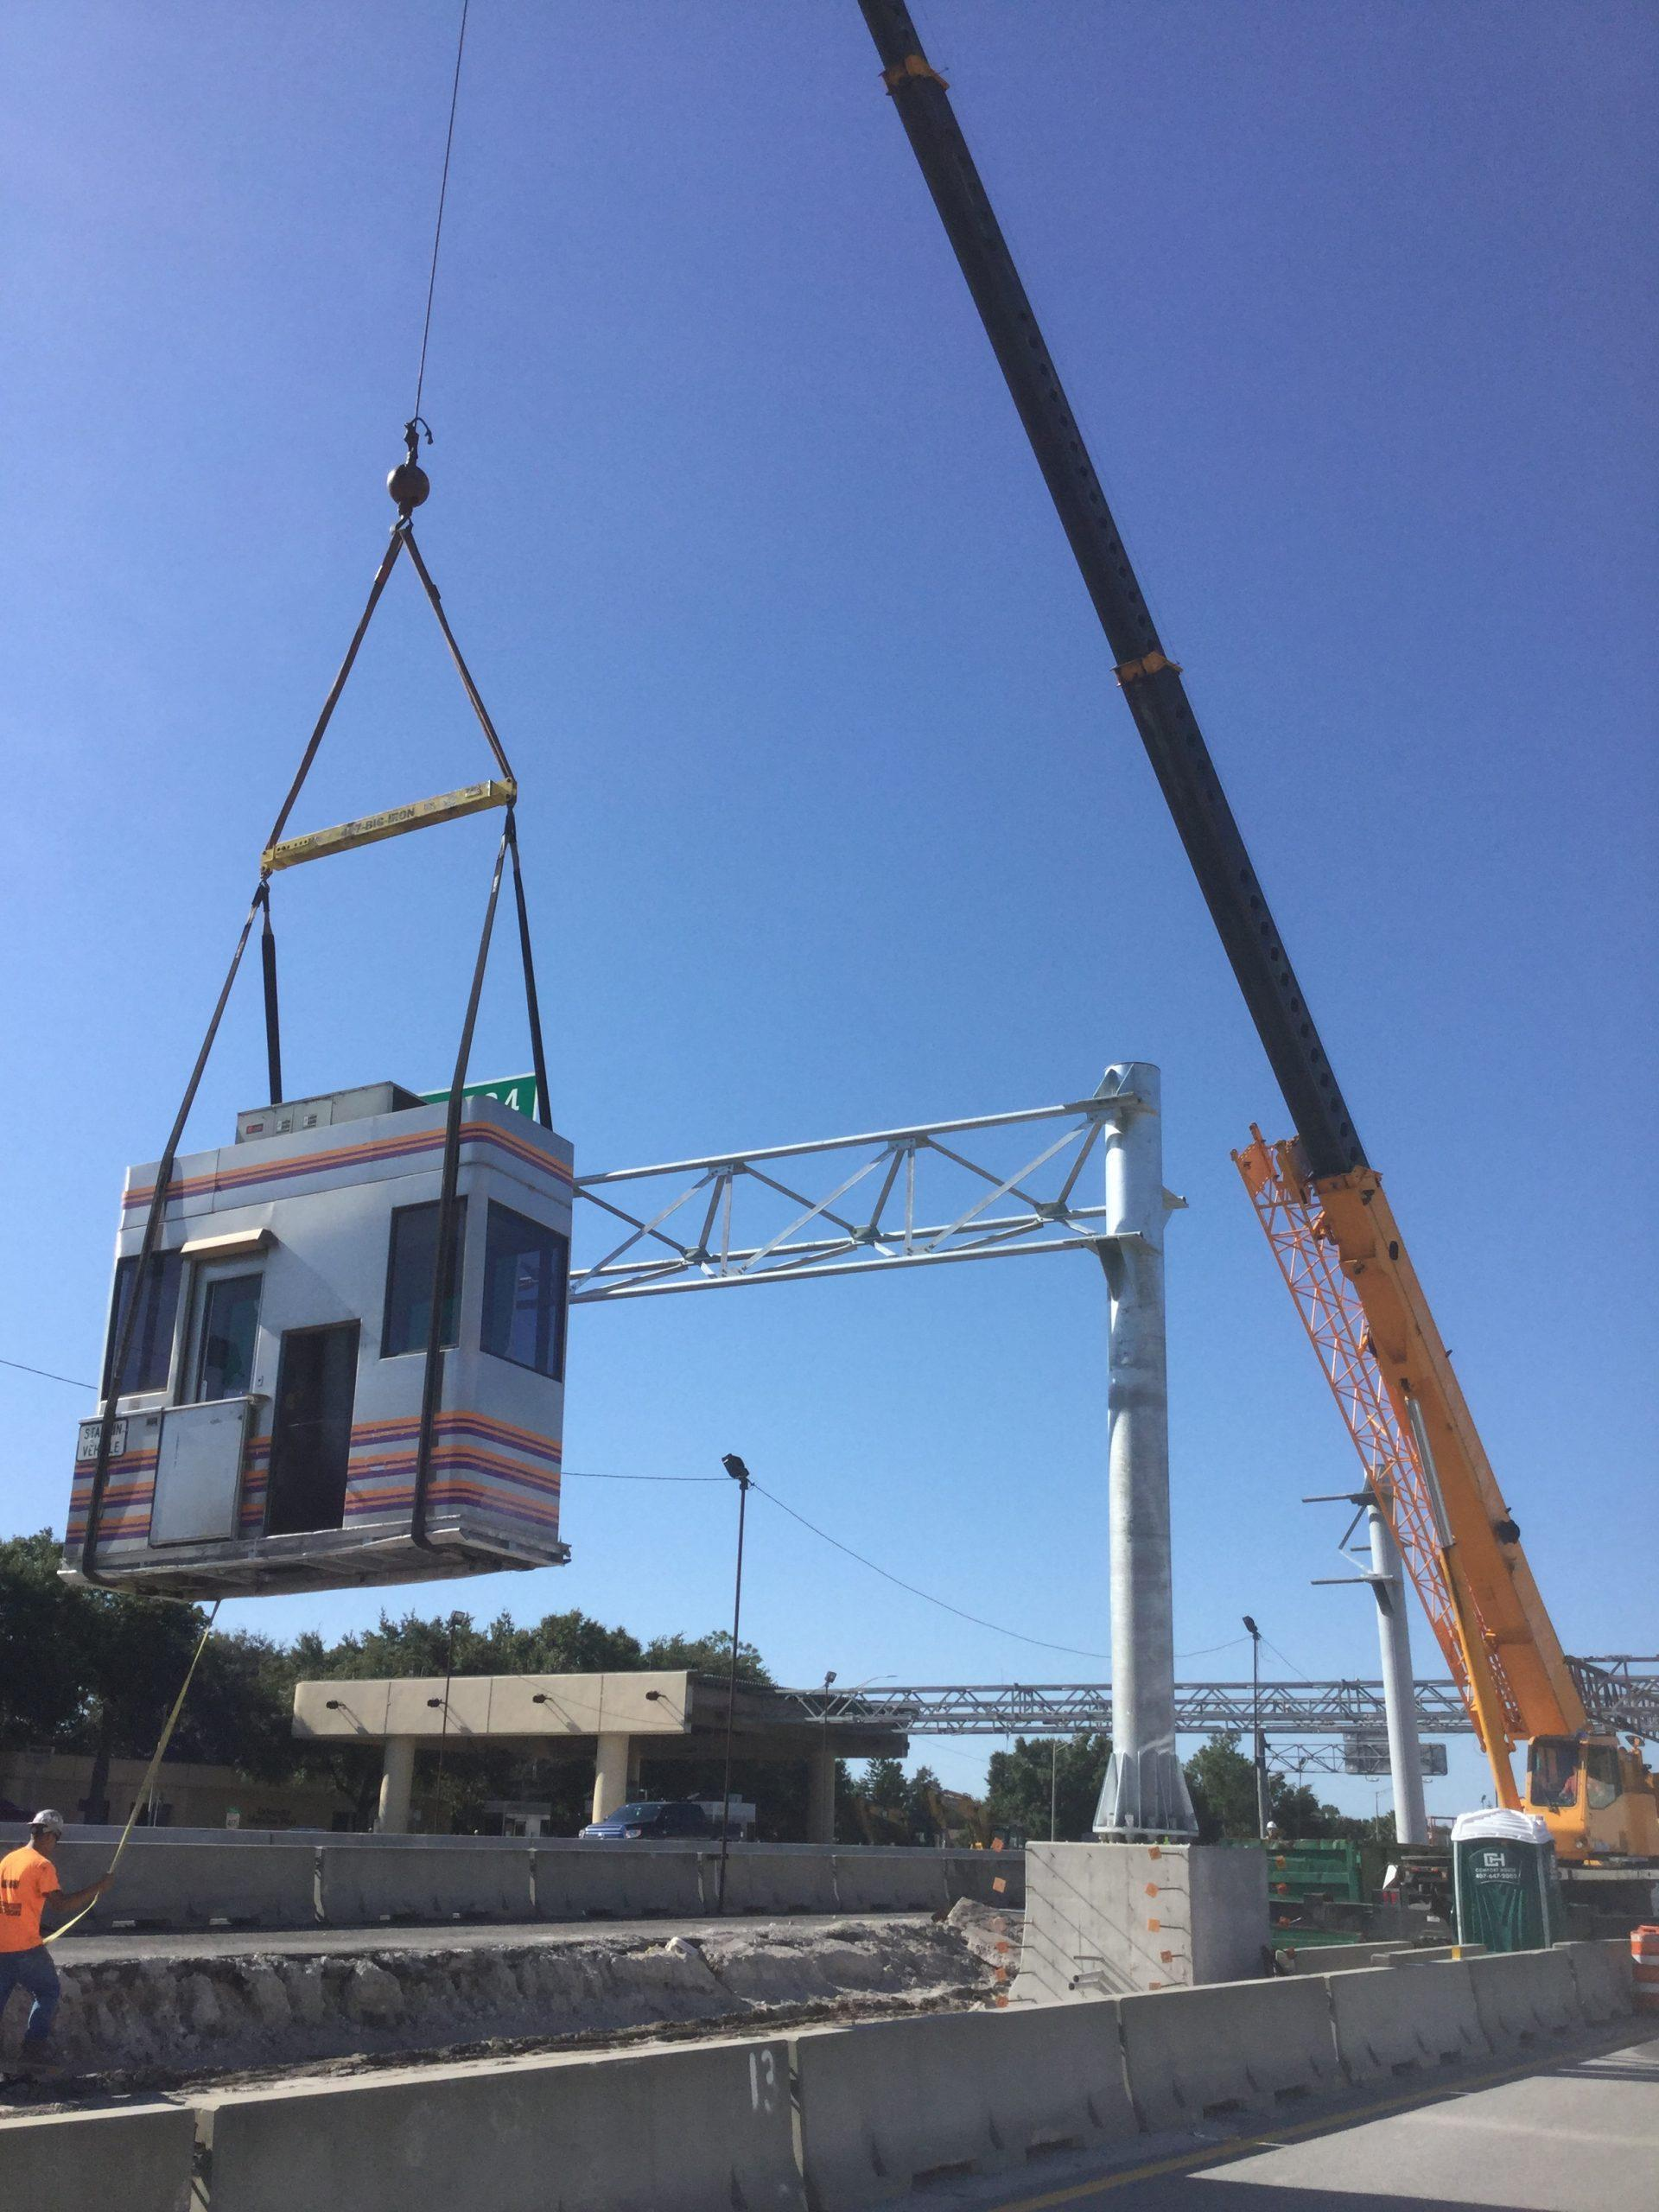 Orlando General Contractor removes Expressway Toll Plaza